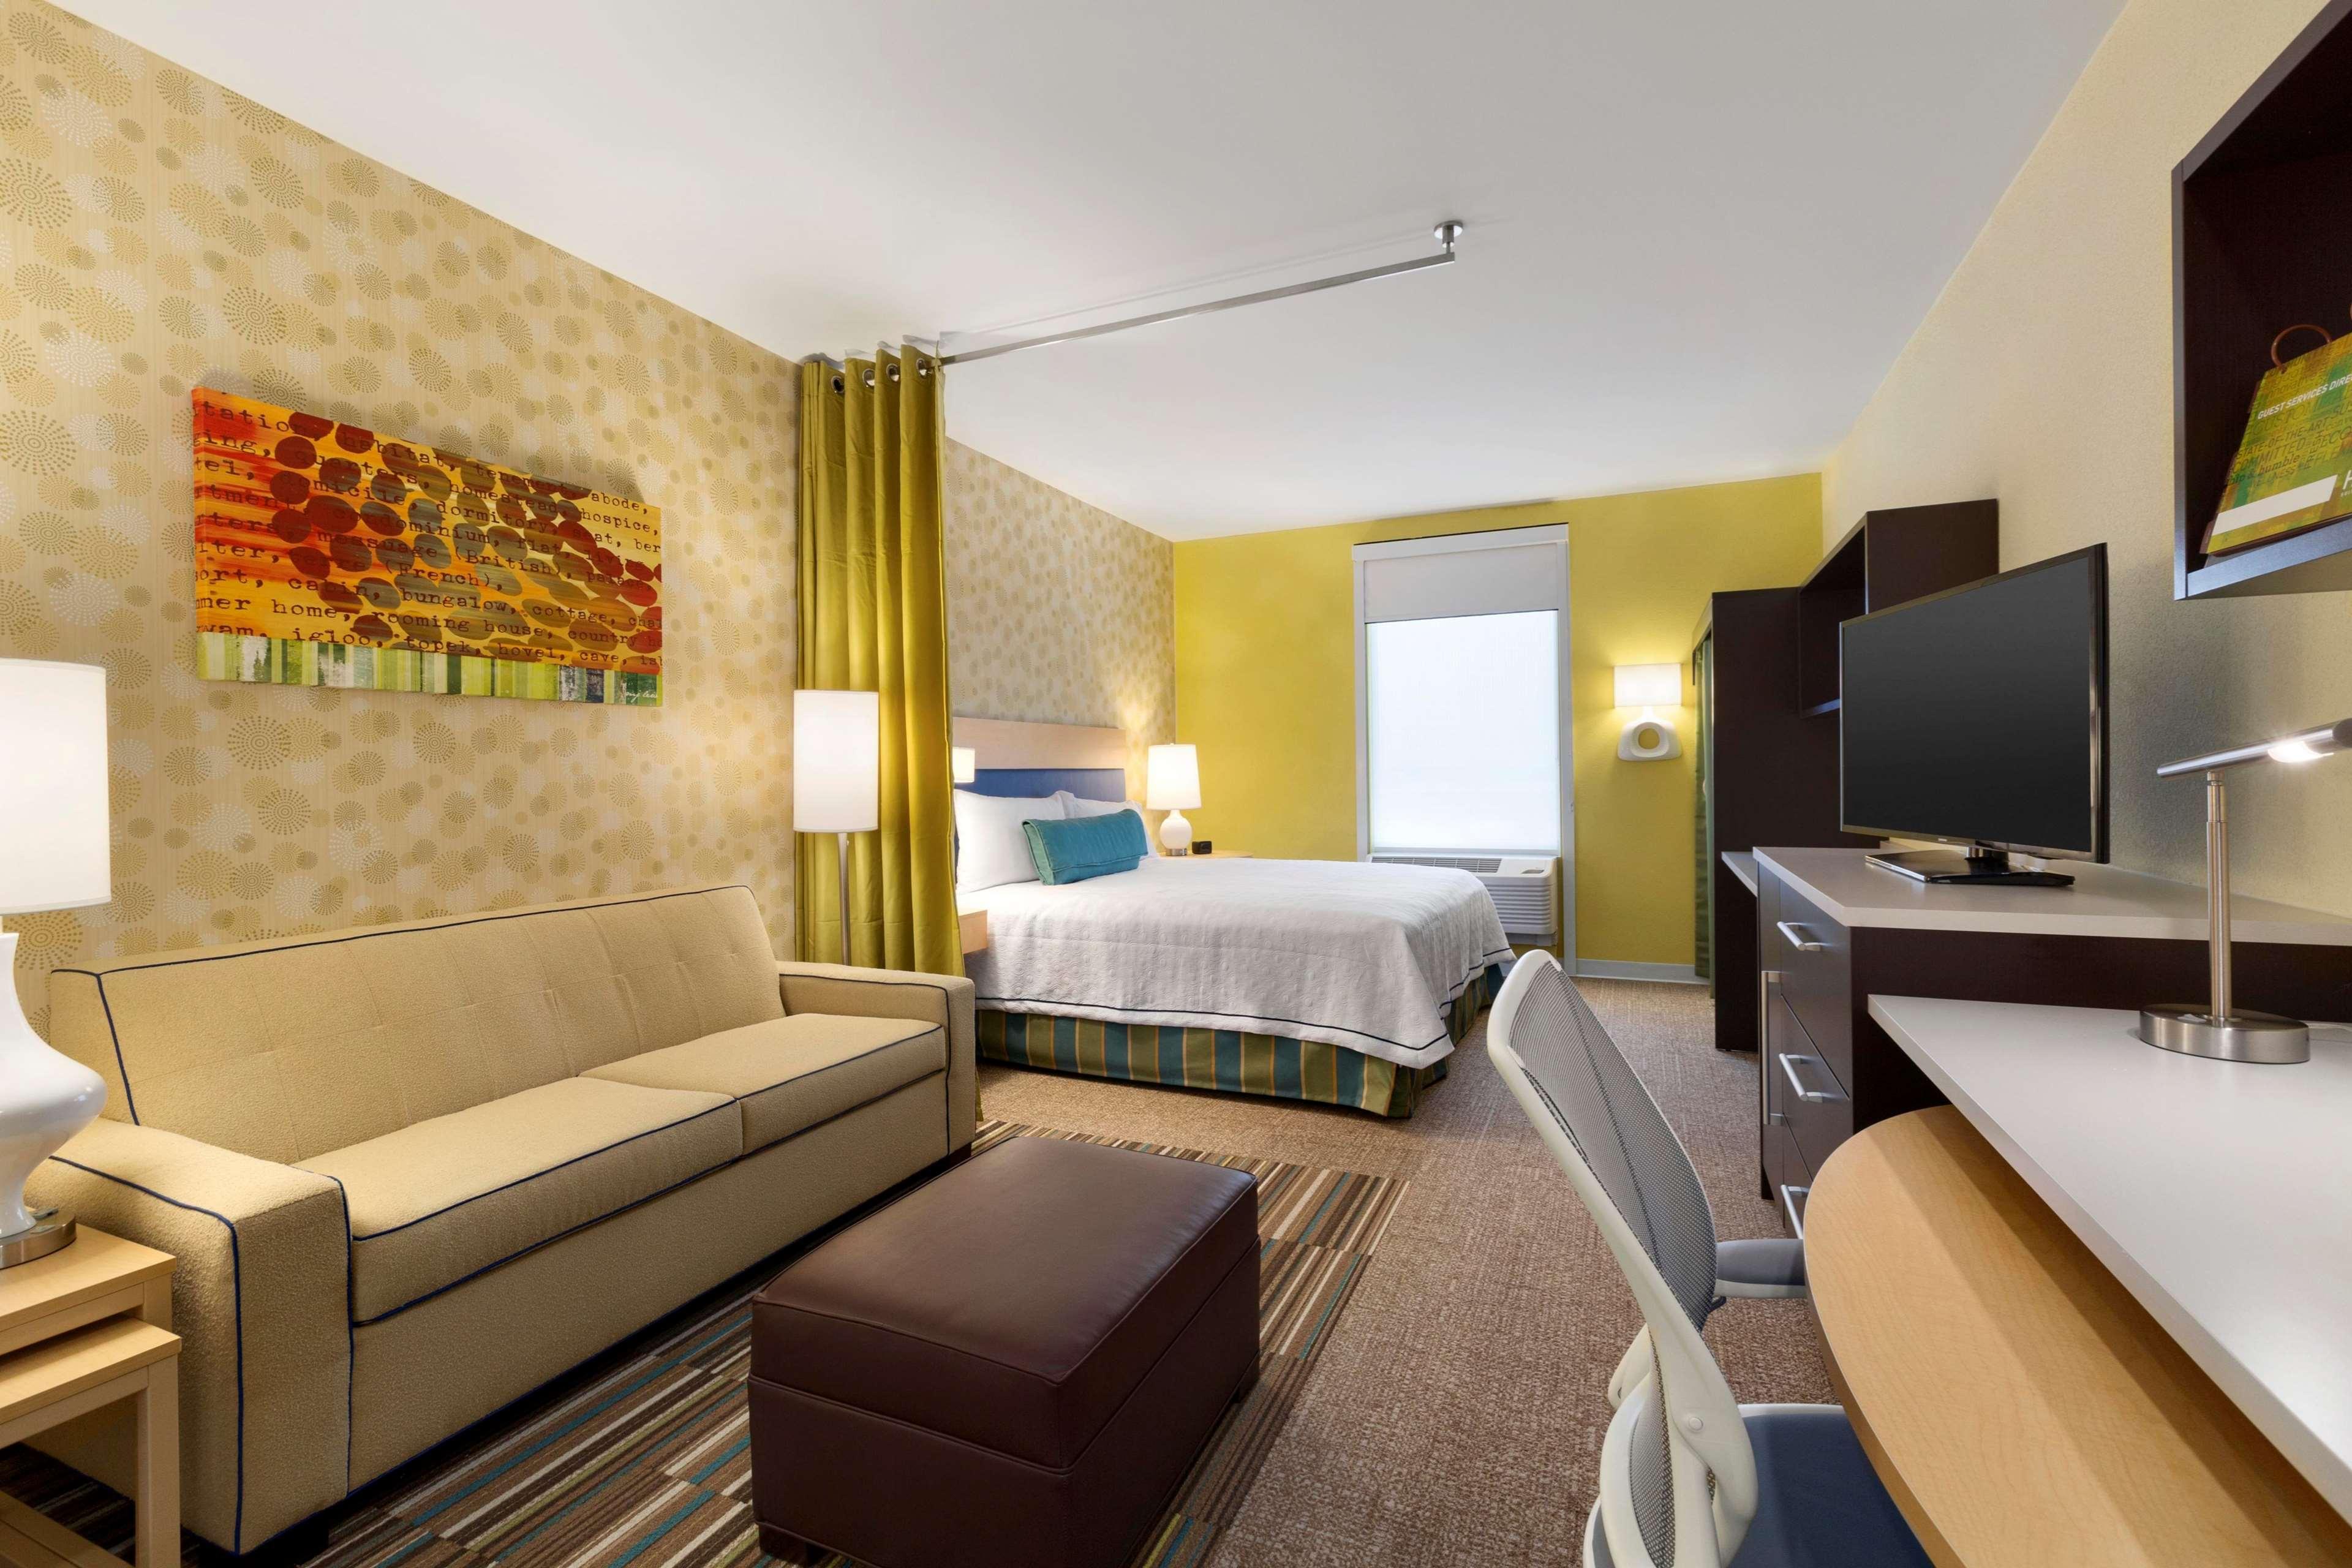 Home2 Suites by Hilton Houston Pasadena image 17